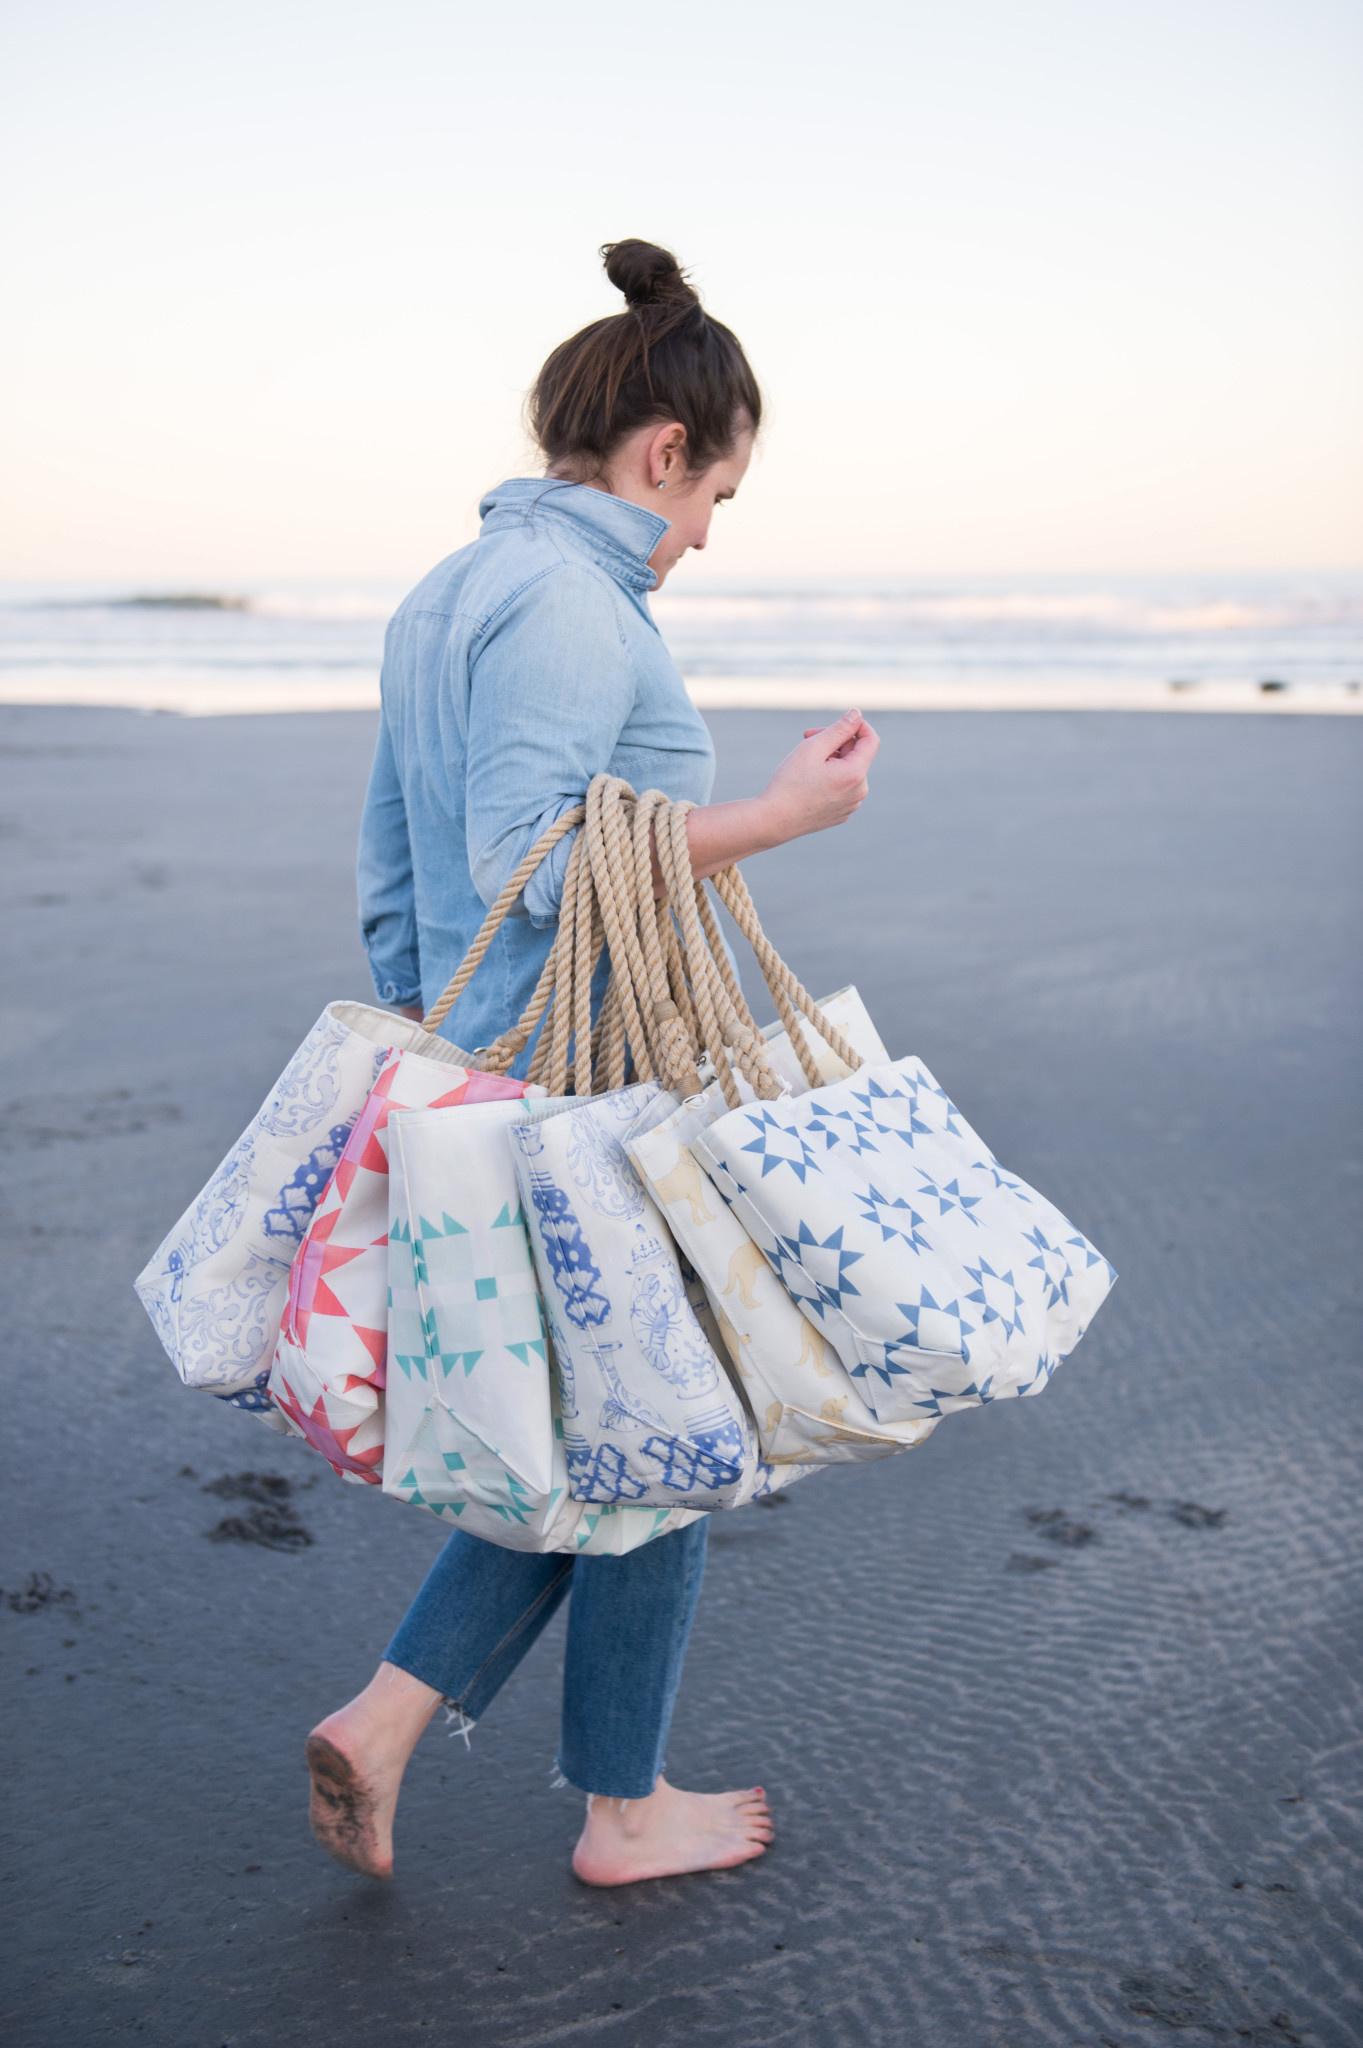 Sea Bags Sara Fitz - Blue Quilt - Small Handbag Tote - Hemp Handle with Clasp